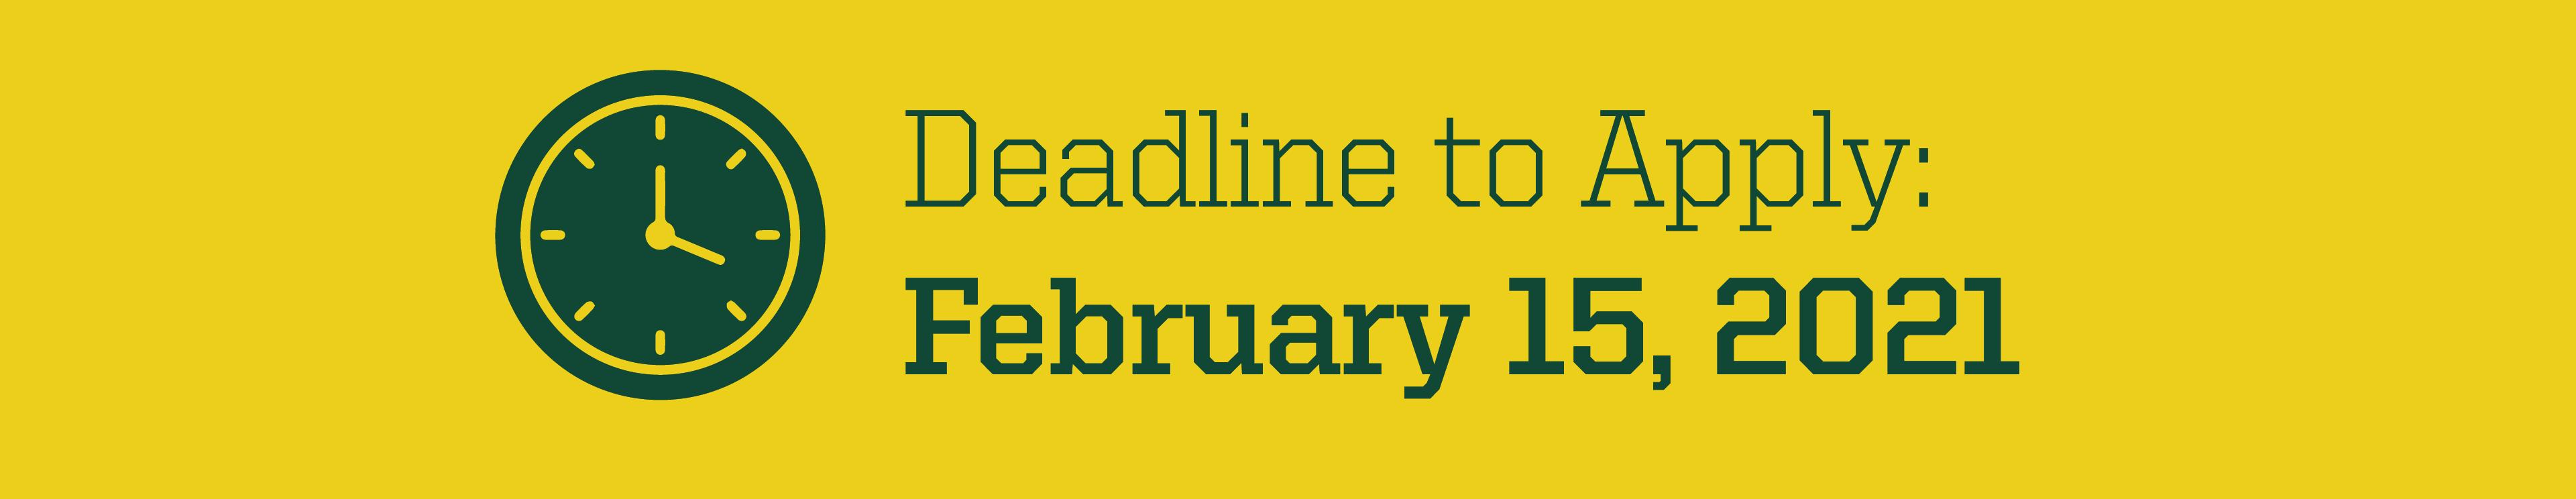 Apply Feb. 15 graphic